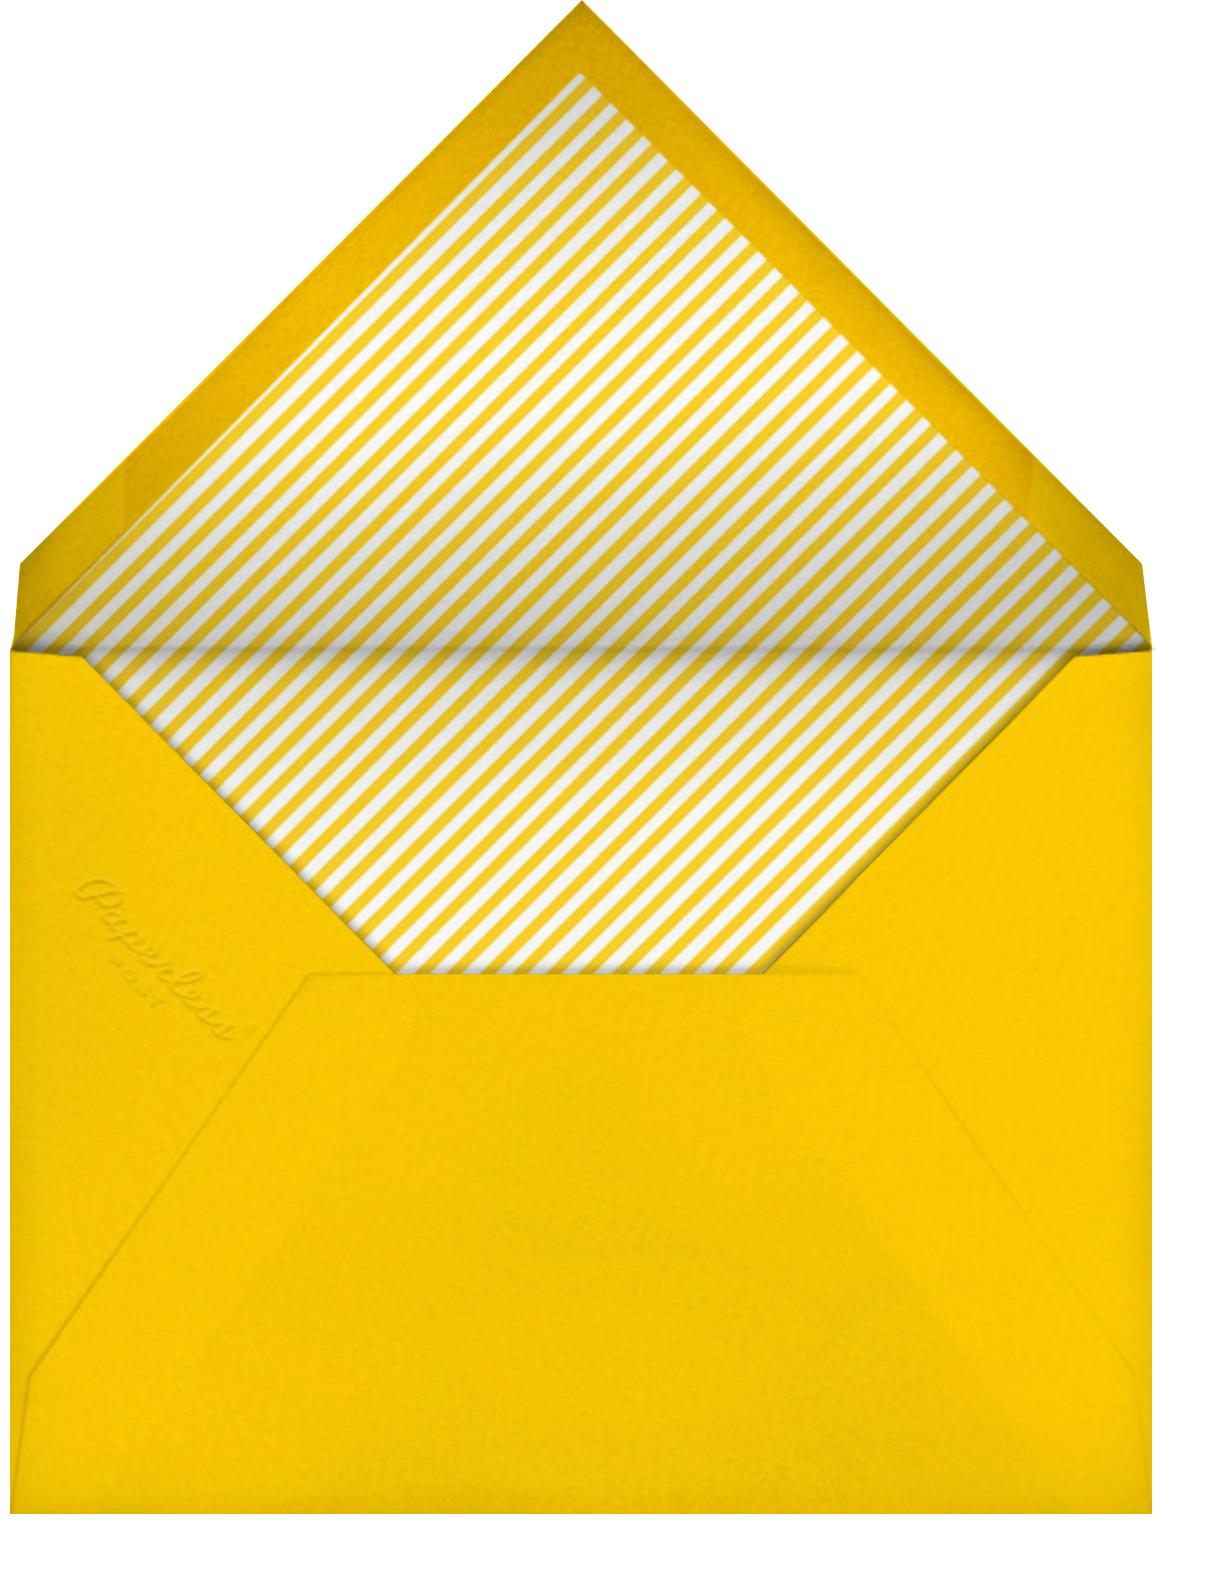 Foam Number One Hand - Paperless Post - Envelope